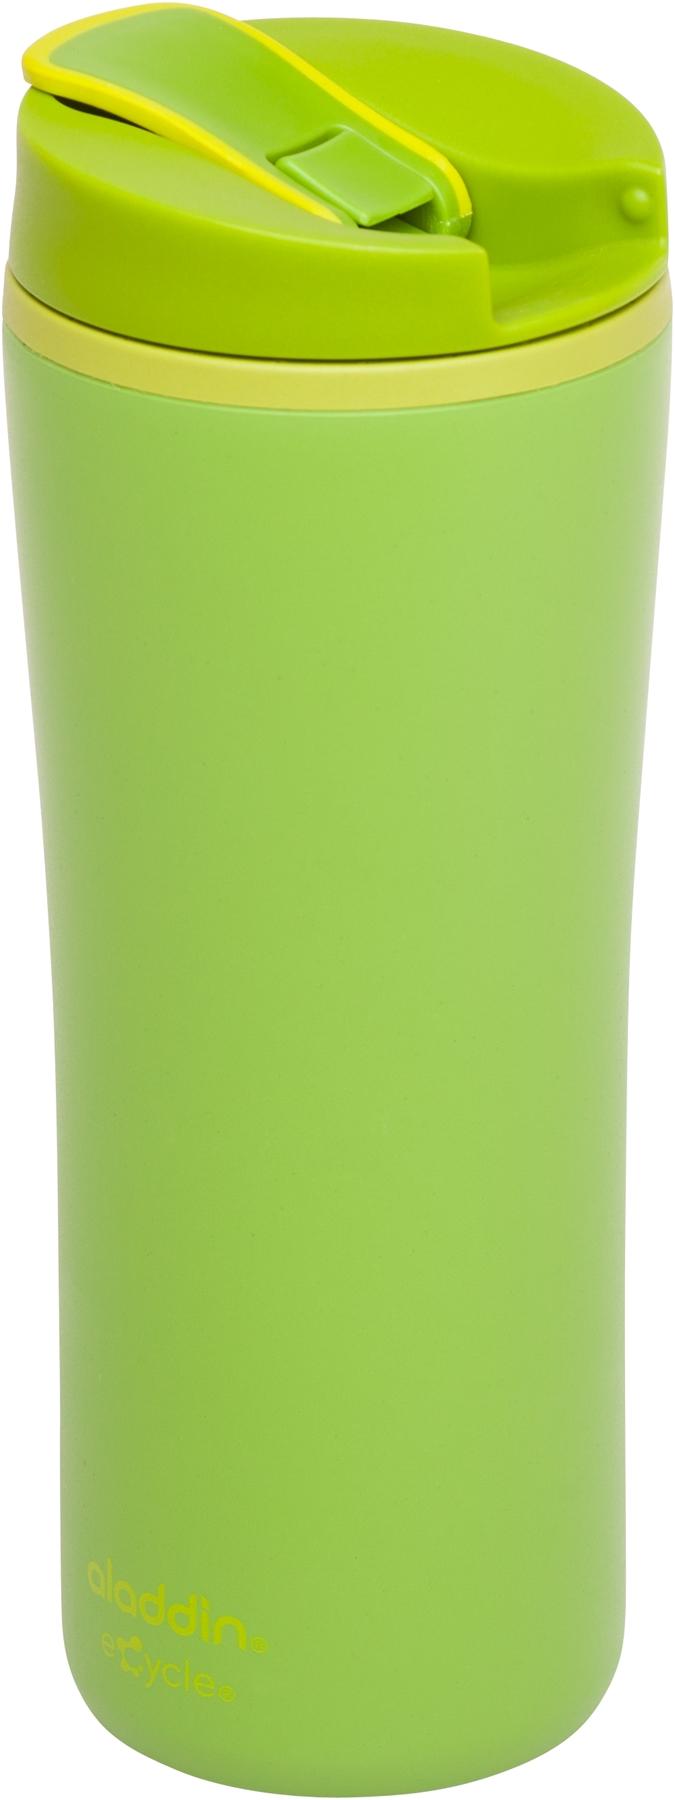 Termohrnek aladdin Flip-Seal zelený